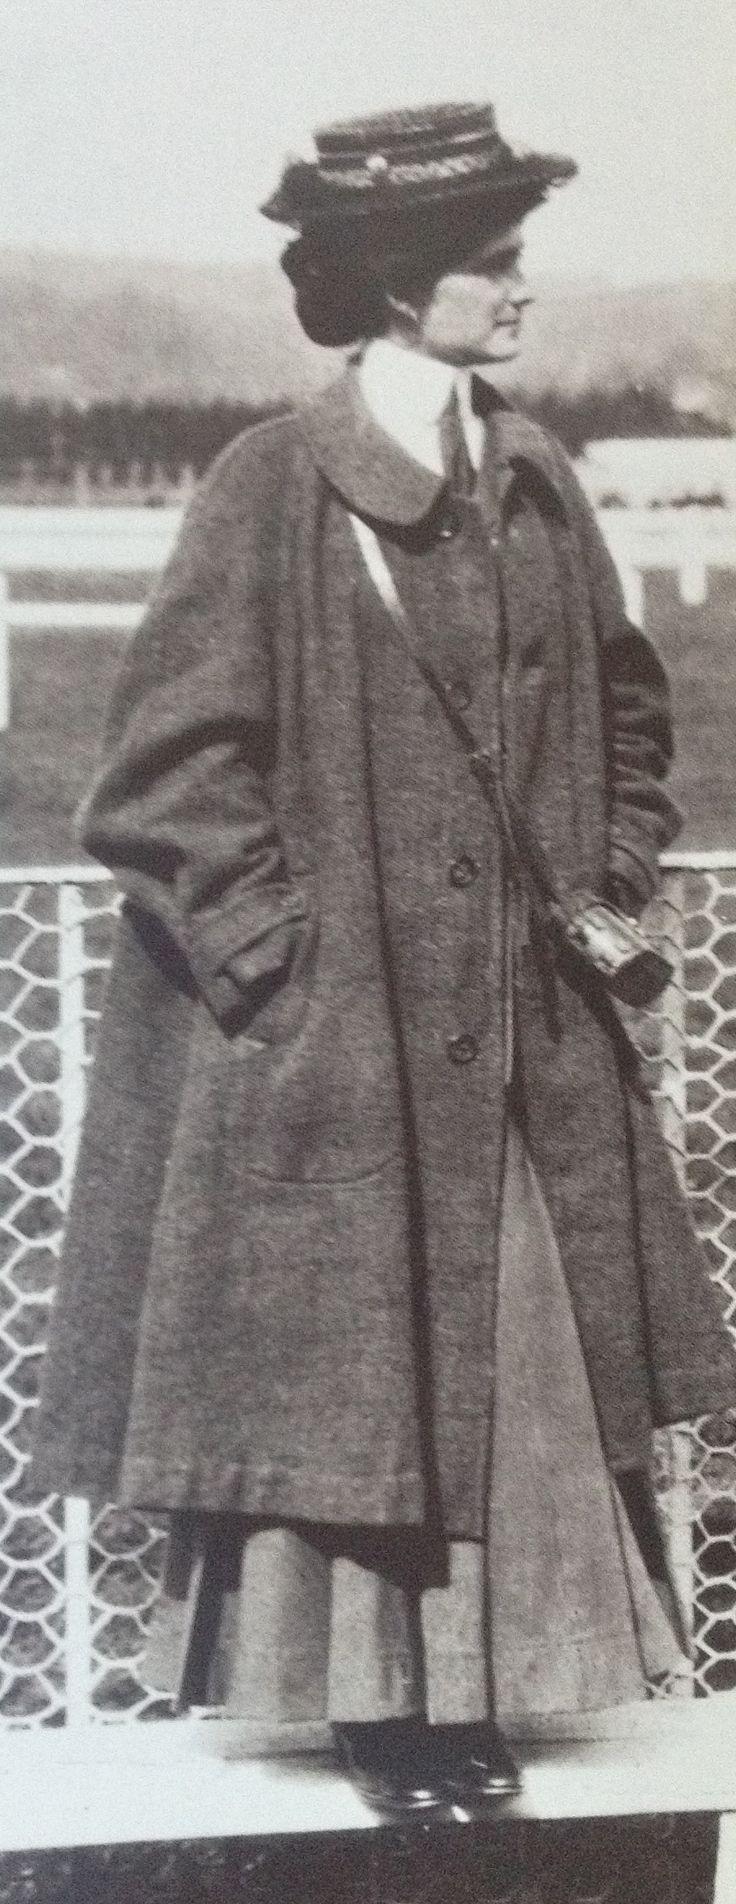 Madame Chanel, 1910.